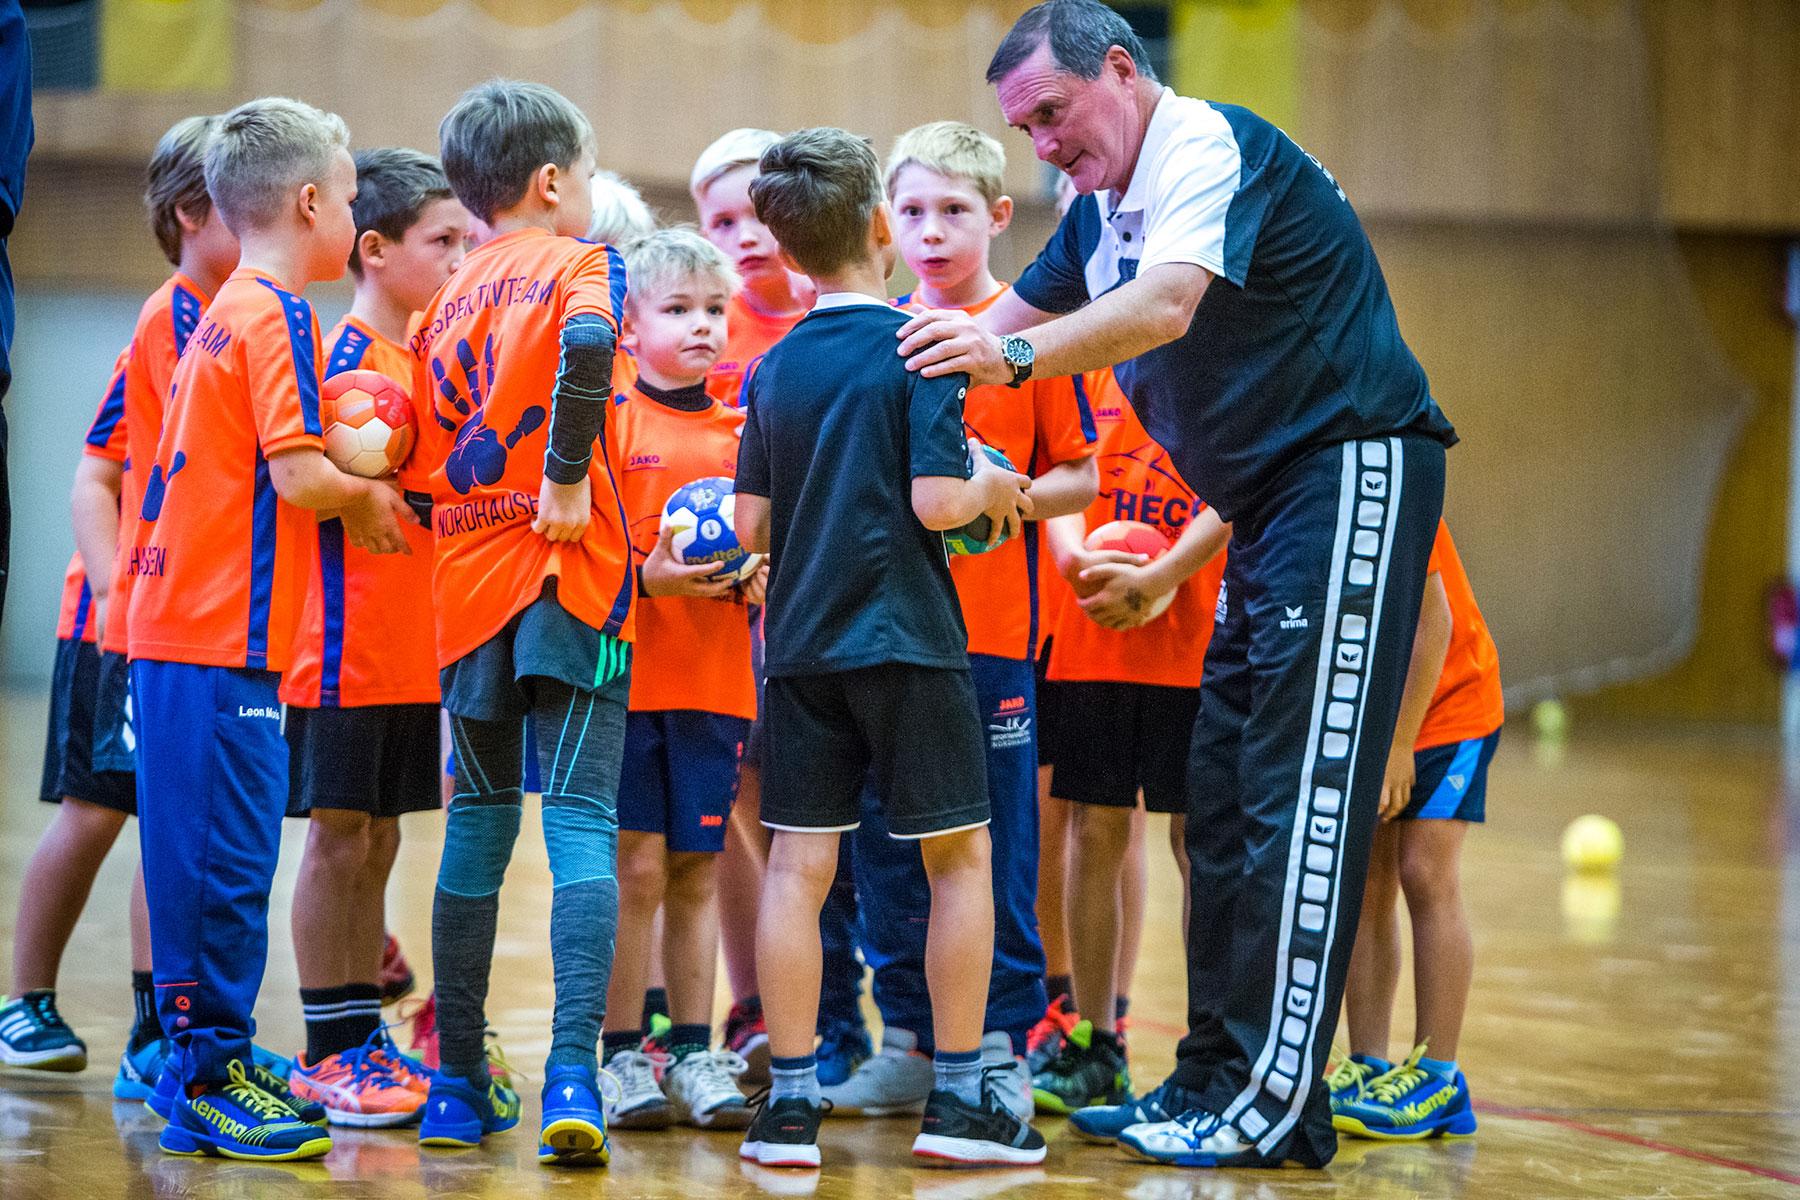 201809_Handballcamp_NDH (20)